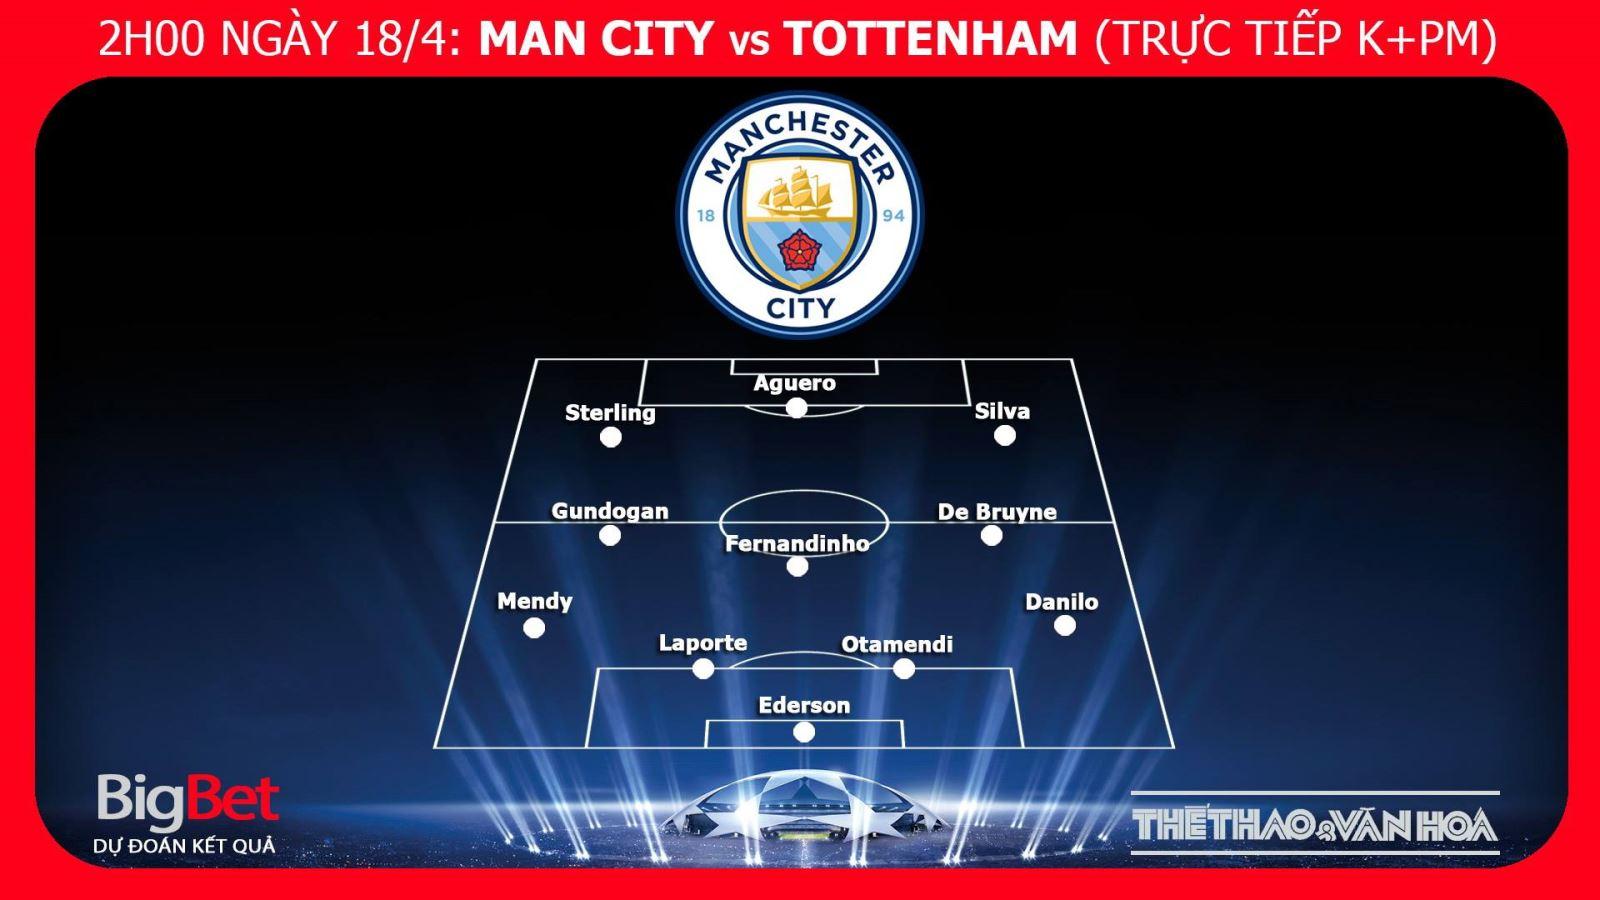 man city, tottenham, trực tiếp man city vs tottenham, trực tiếp bóng đá, lịch thi đấu Cúp 1, soi kèo man city vs tottenham